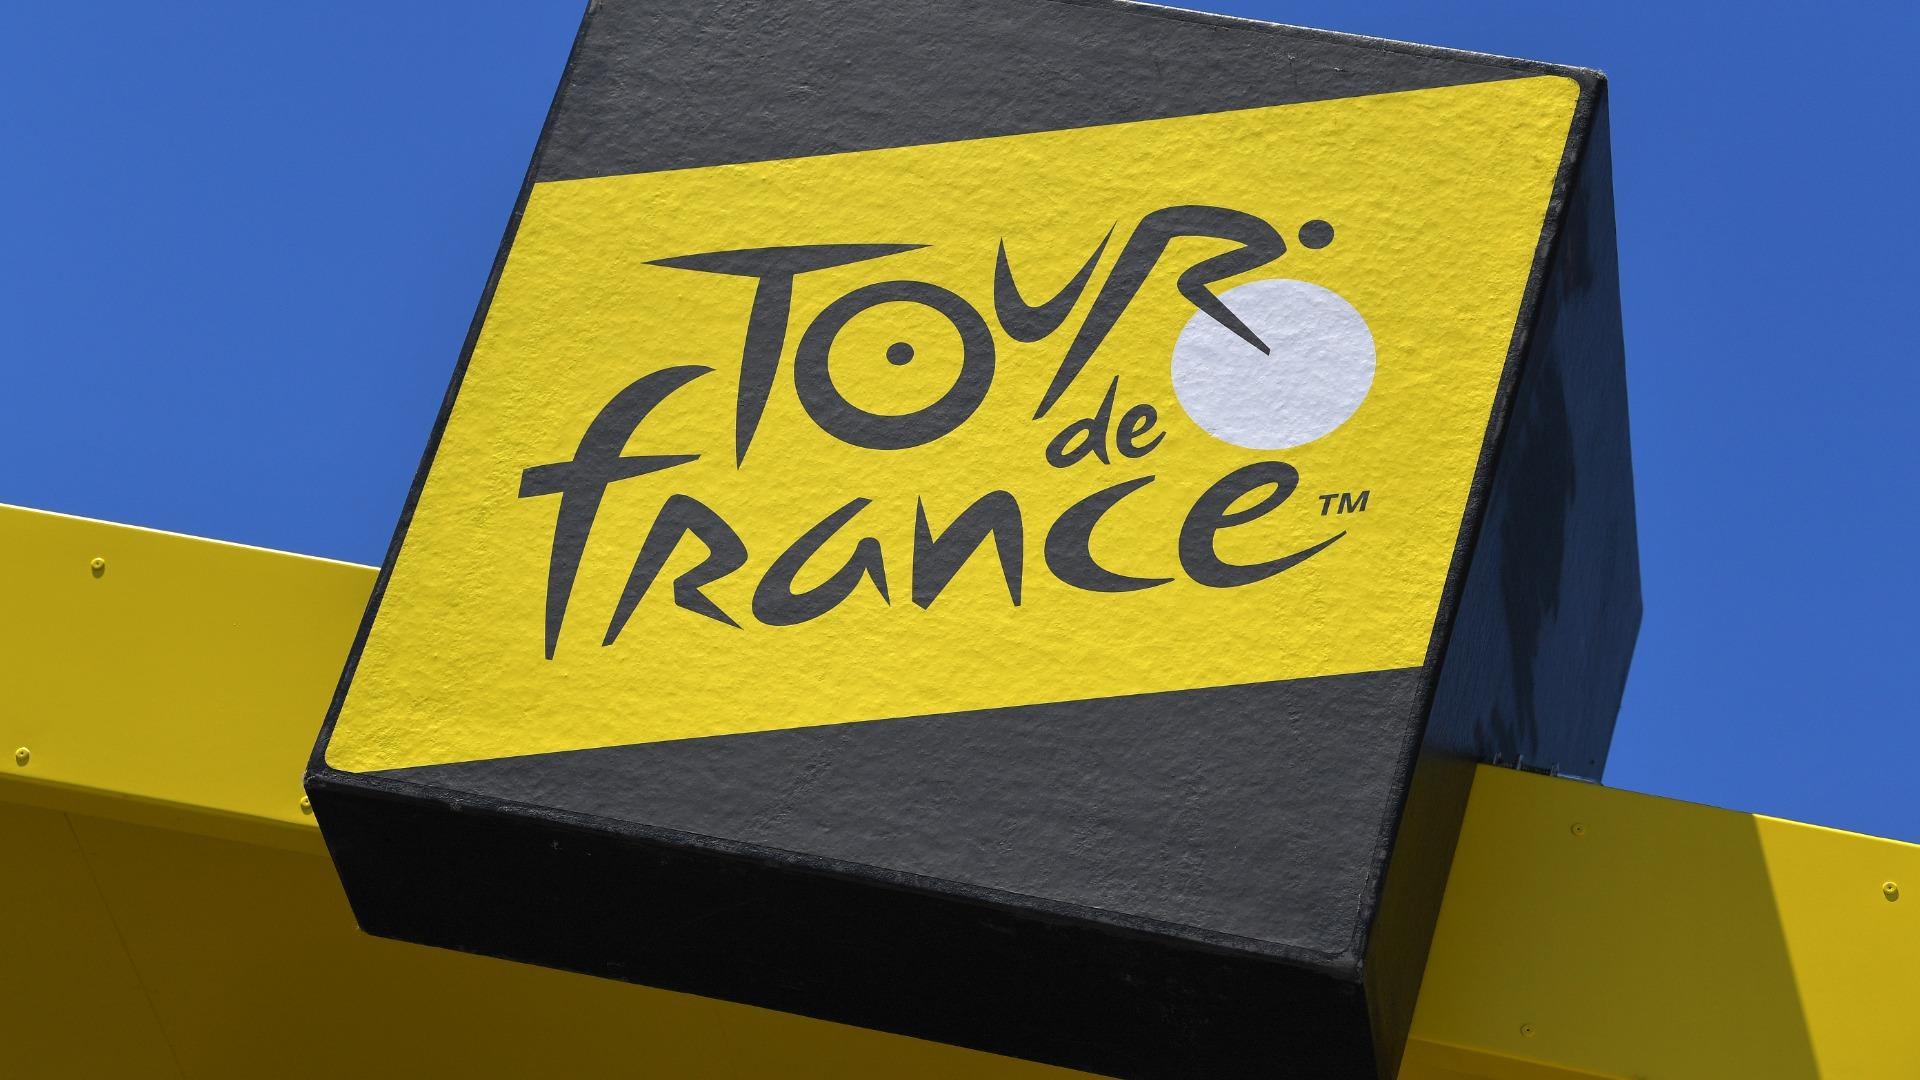 Bilbao to host 2023 Tour de France Grand Depart